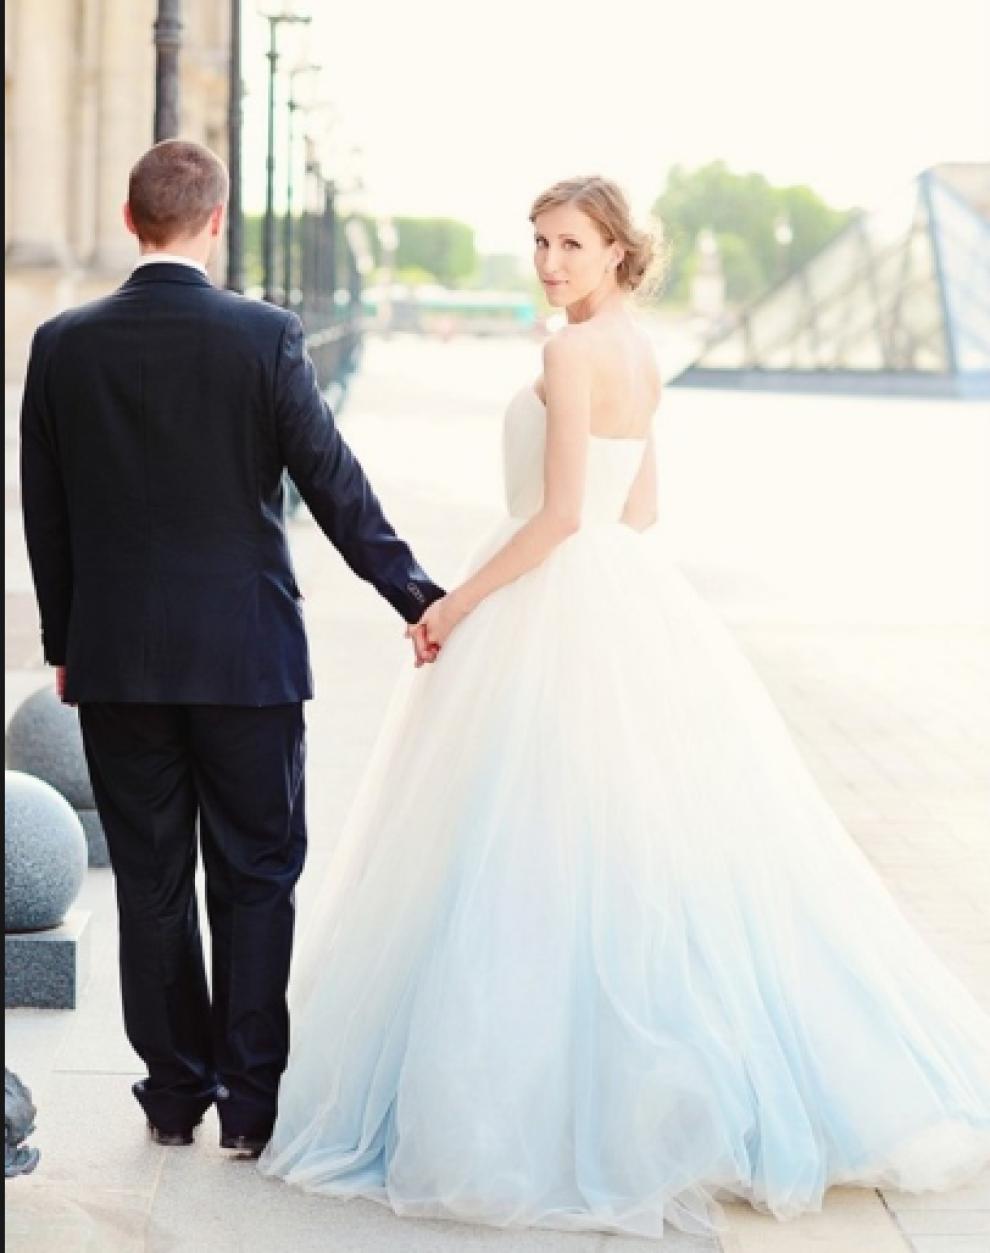 141009092513 600 disney frozen wedding dress - Vestito Da Sposa Harry Potter 6 Movie